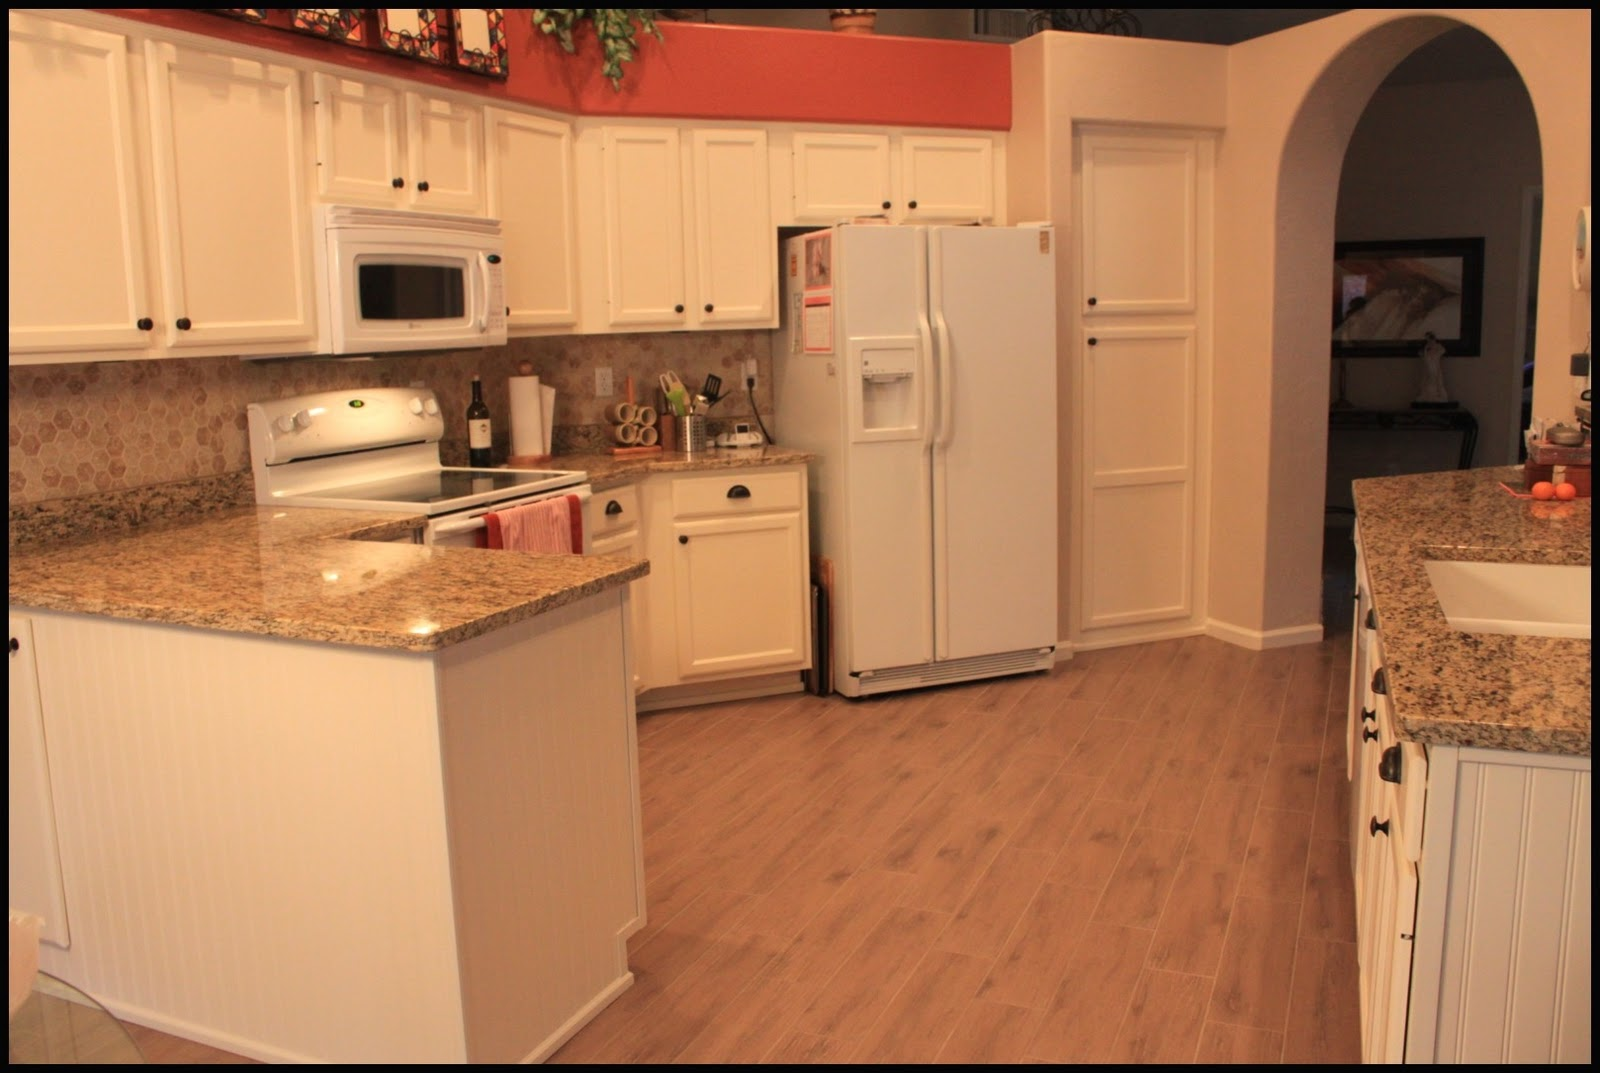 kitchen designs with white appliances - home design ideas